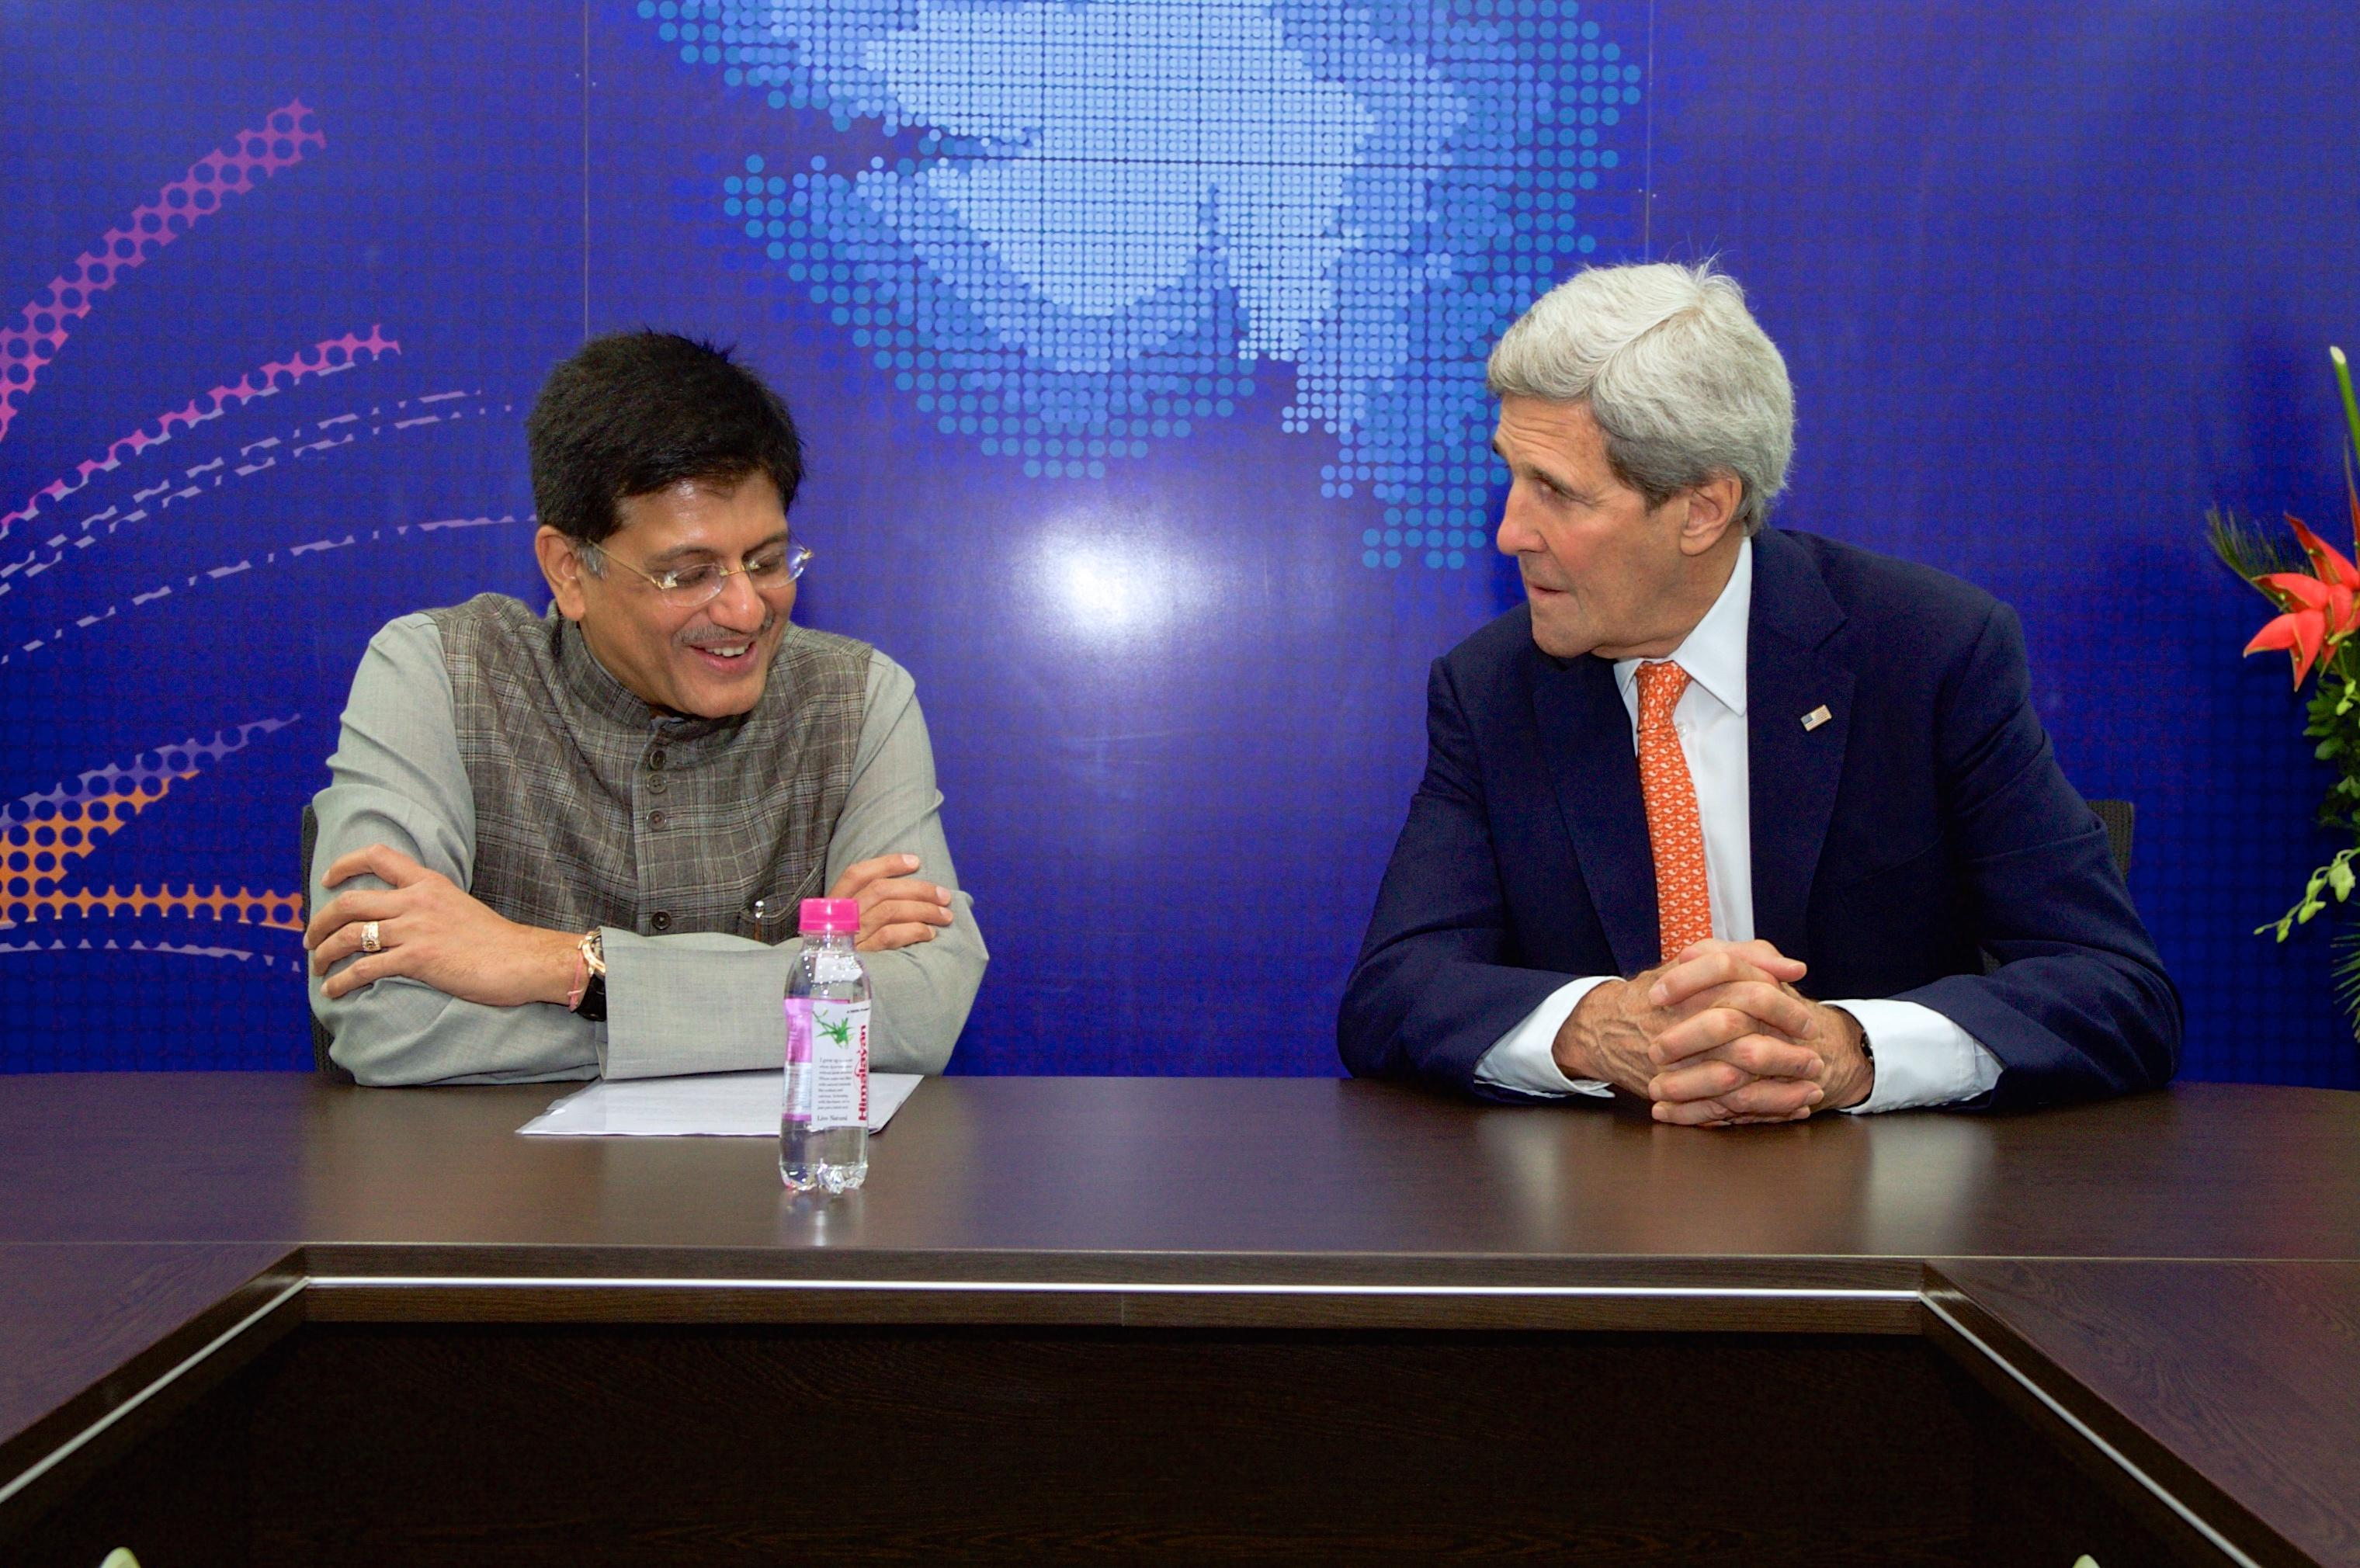 Commerce and Industry Minister Piyush Goyal (left) with former US Senator John Kerry. Photo courtesy: Wikimedia